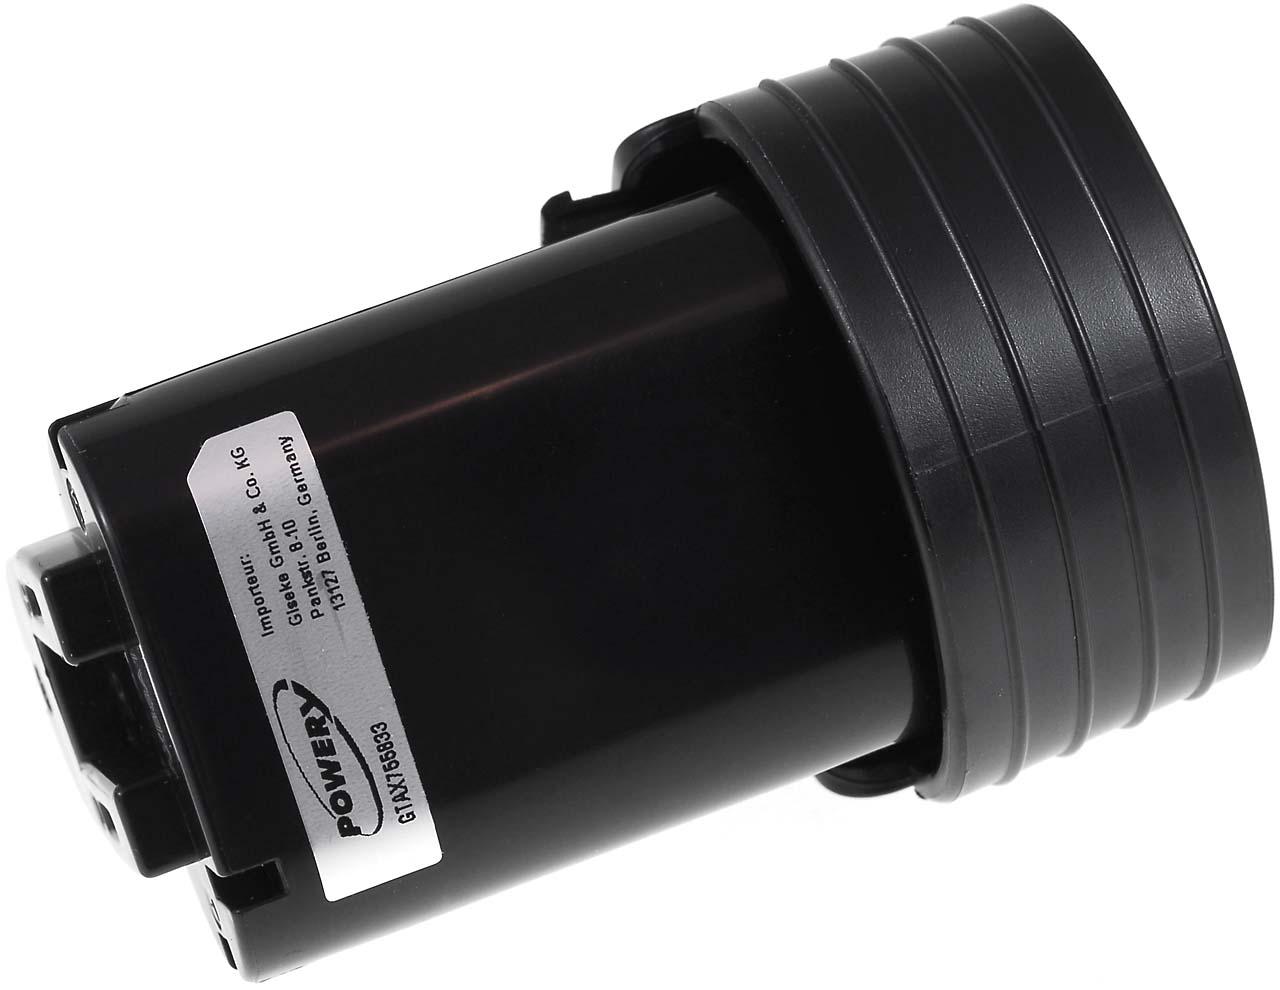 Acumulator compatibil Makita DF330DWX